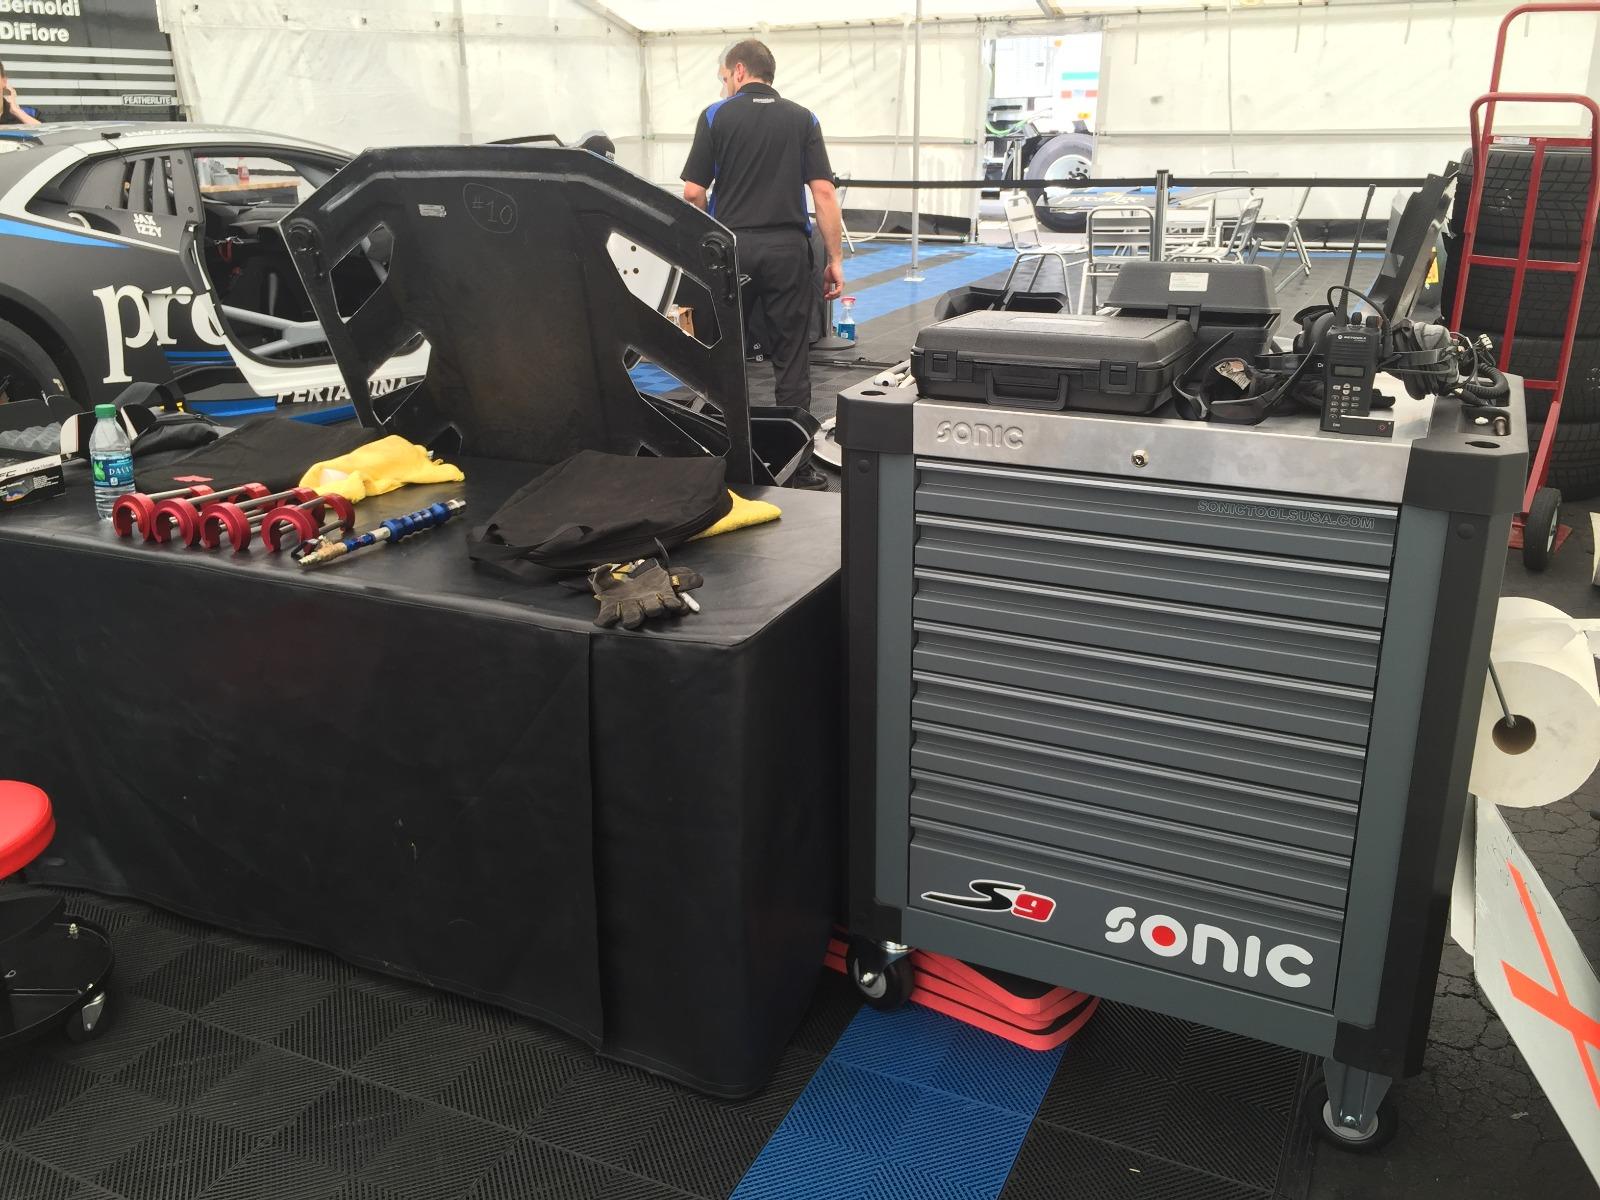 Prestige racing using S9 Toolbox